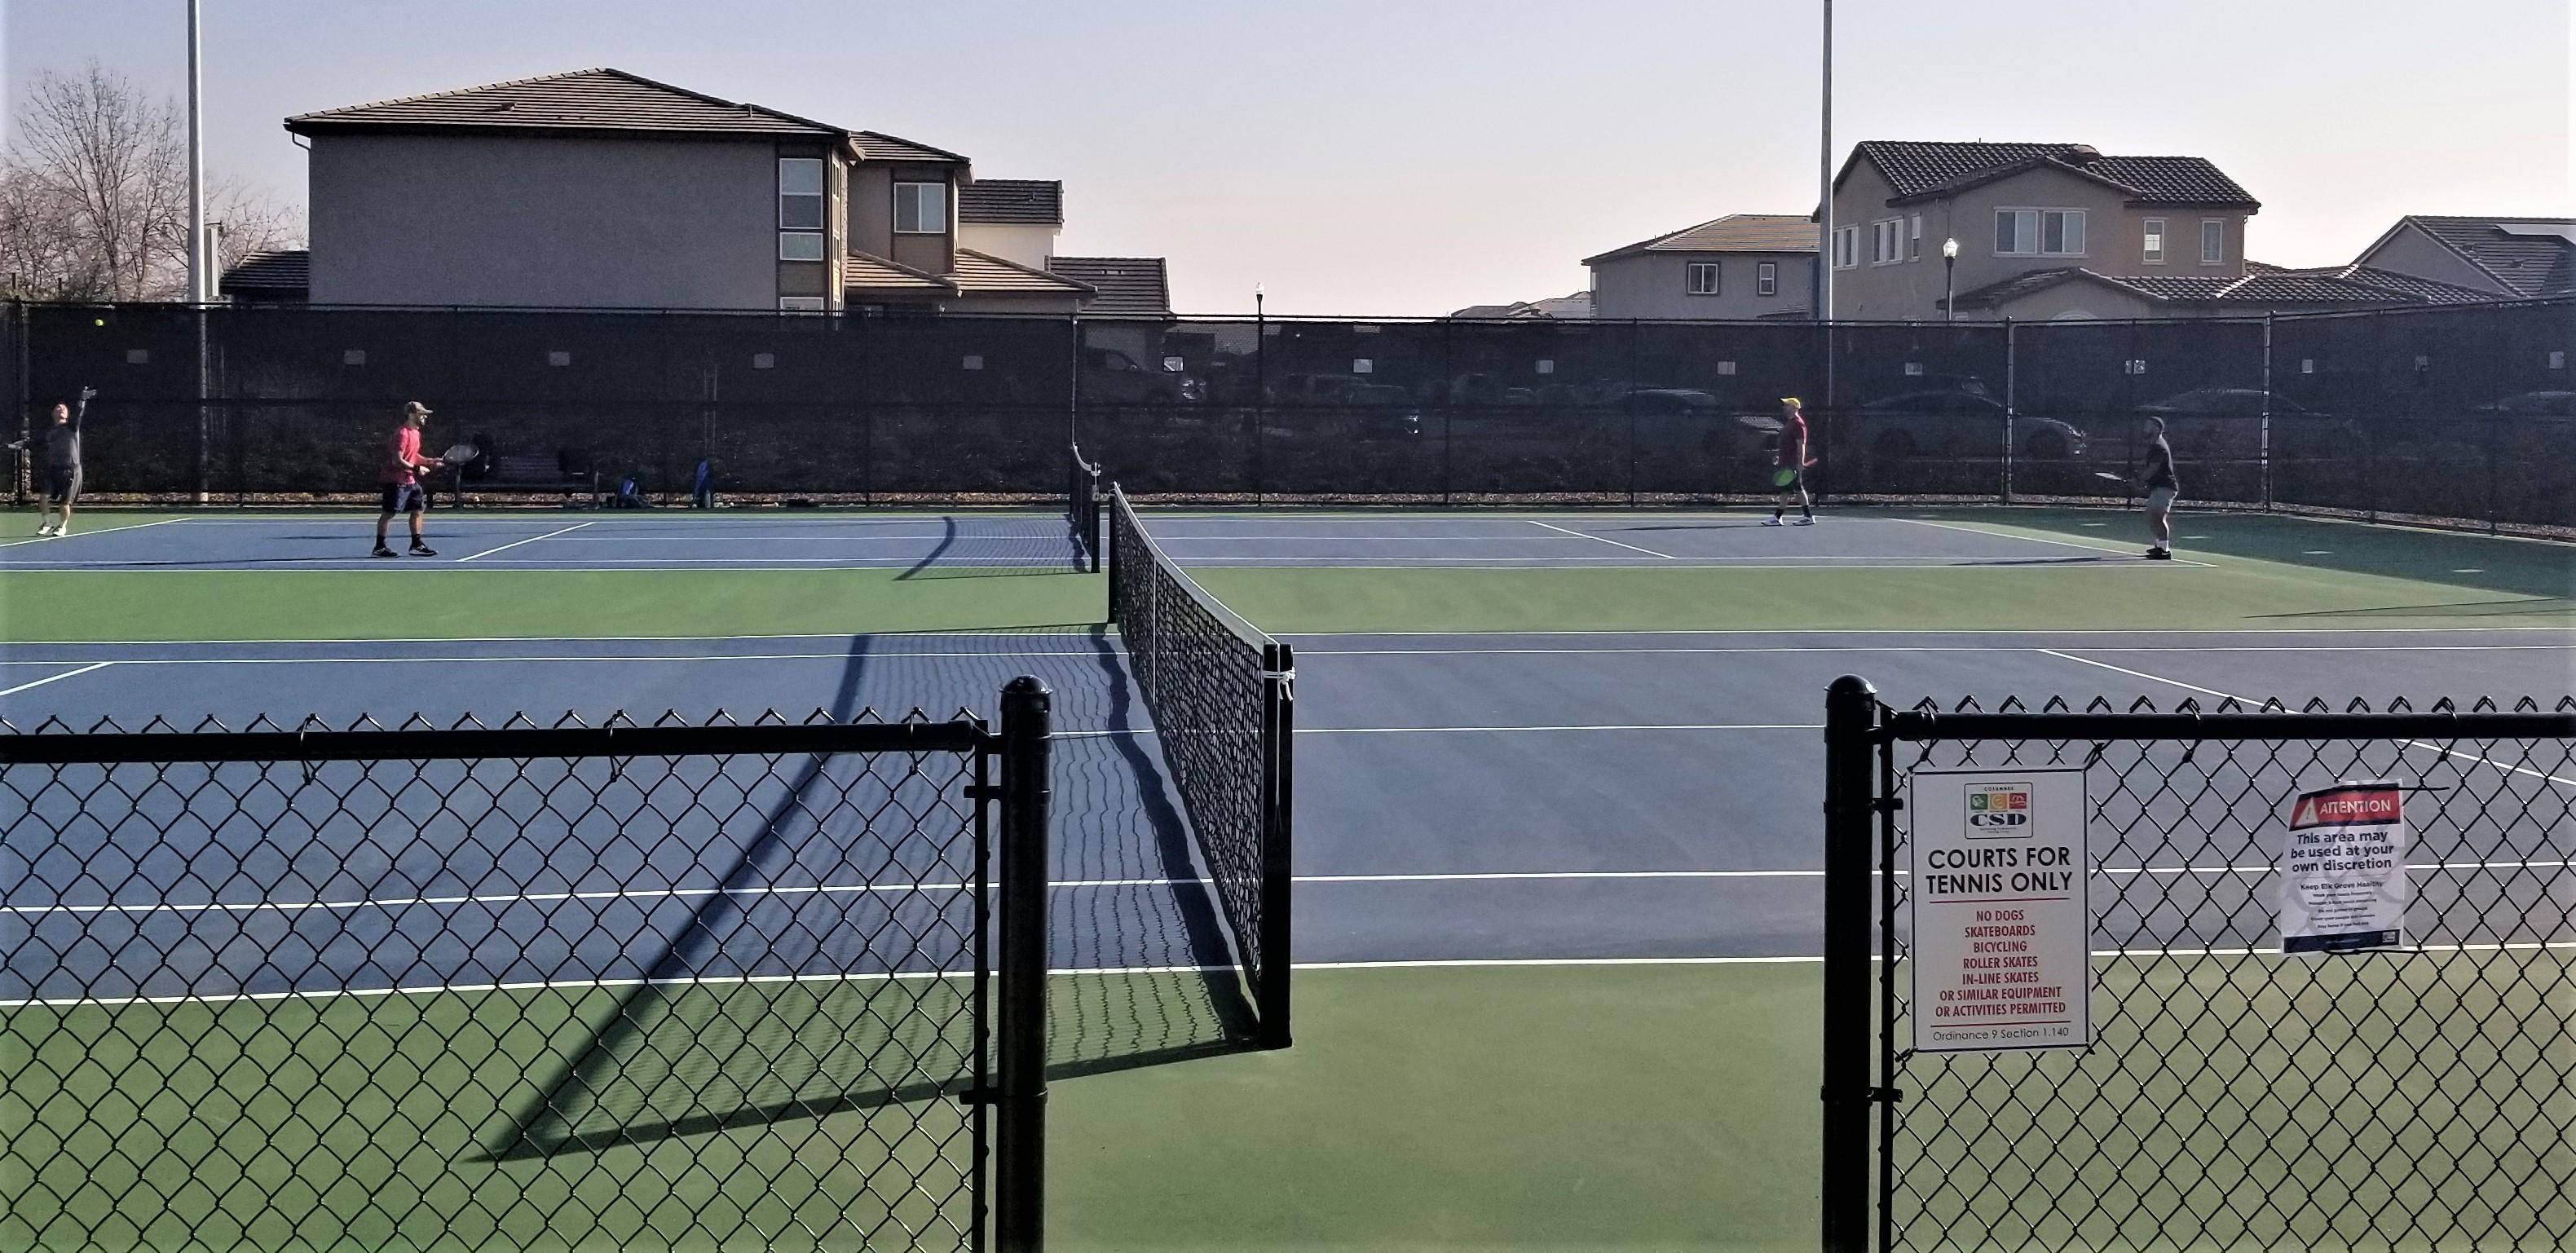 Oasis Park Tennis Courts